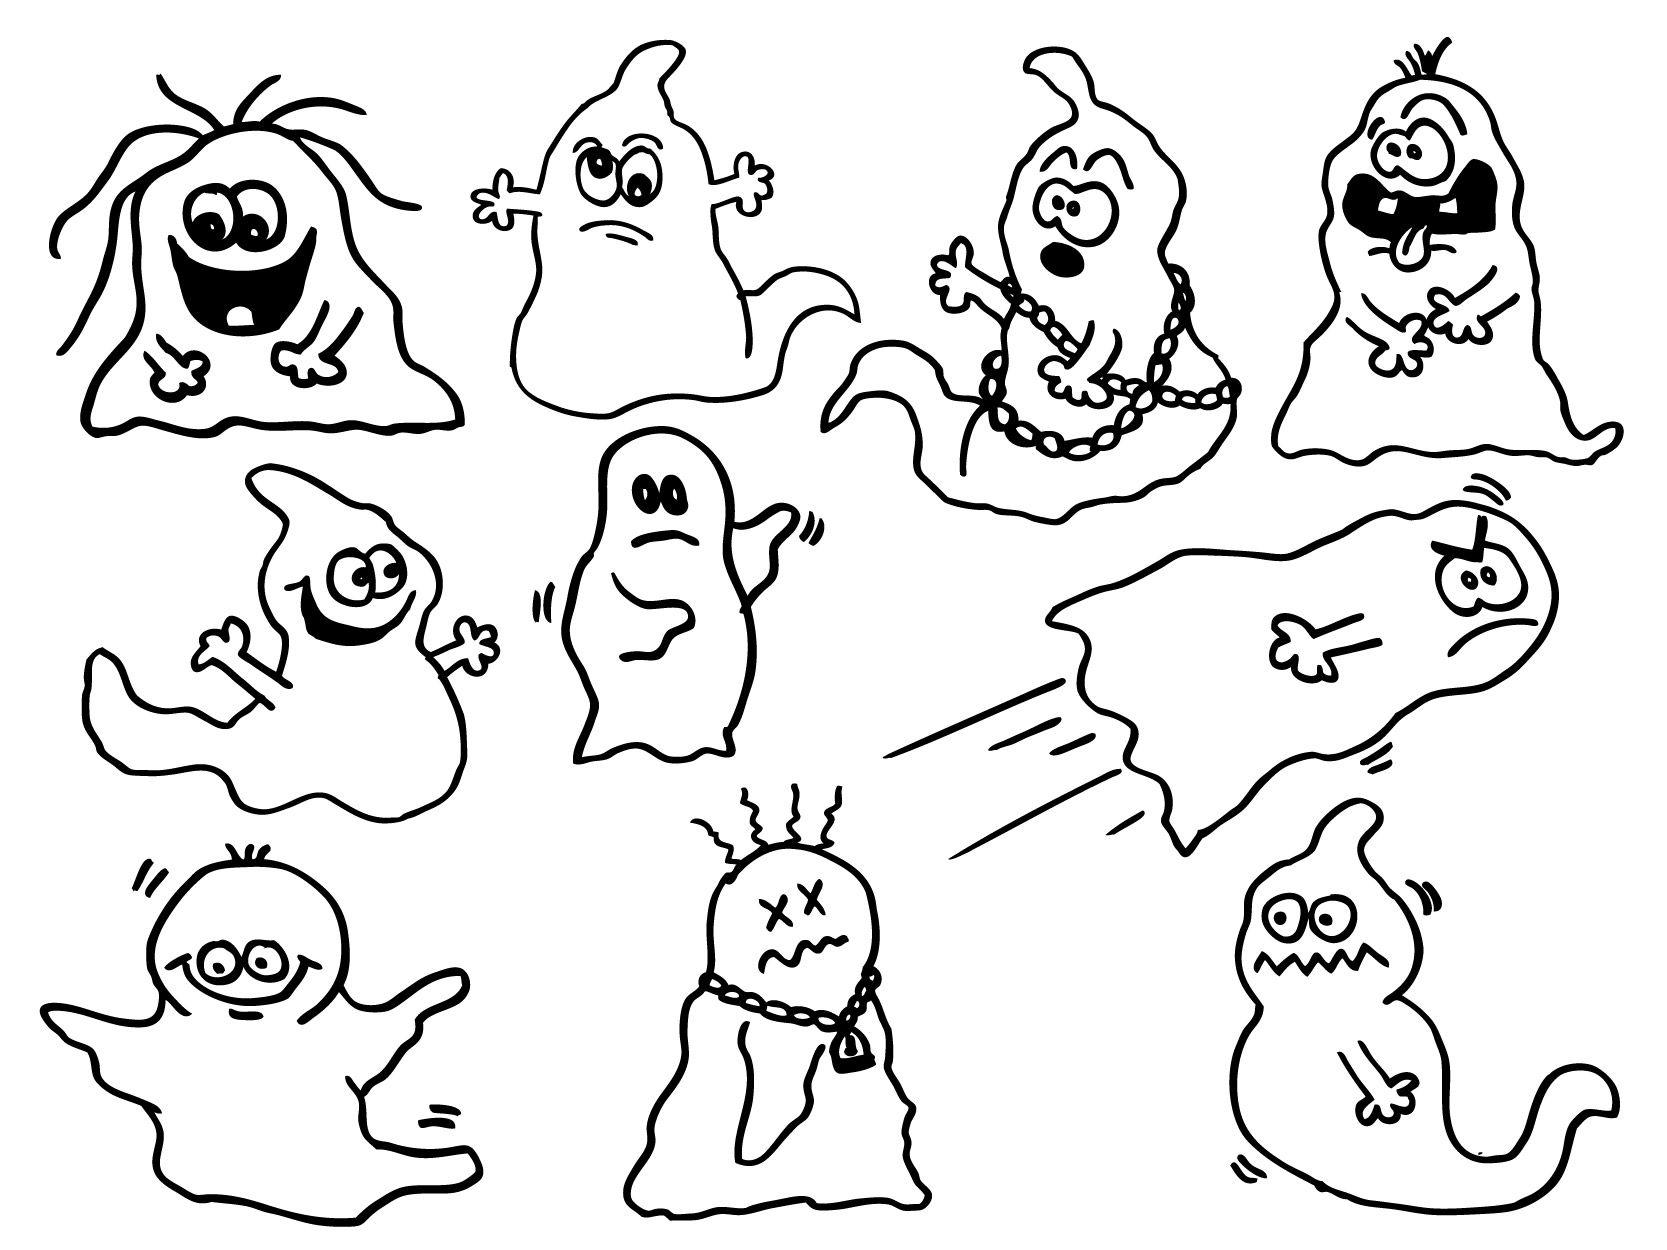 Gespenster Geist malen Gespenst Gespenst kostüm